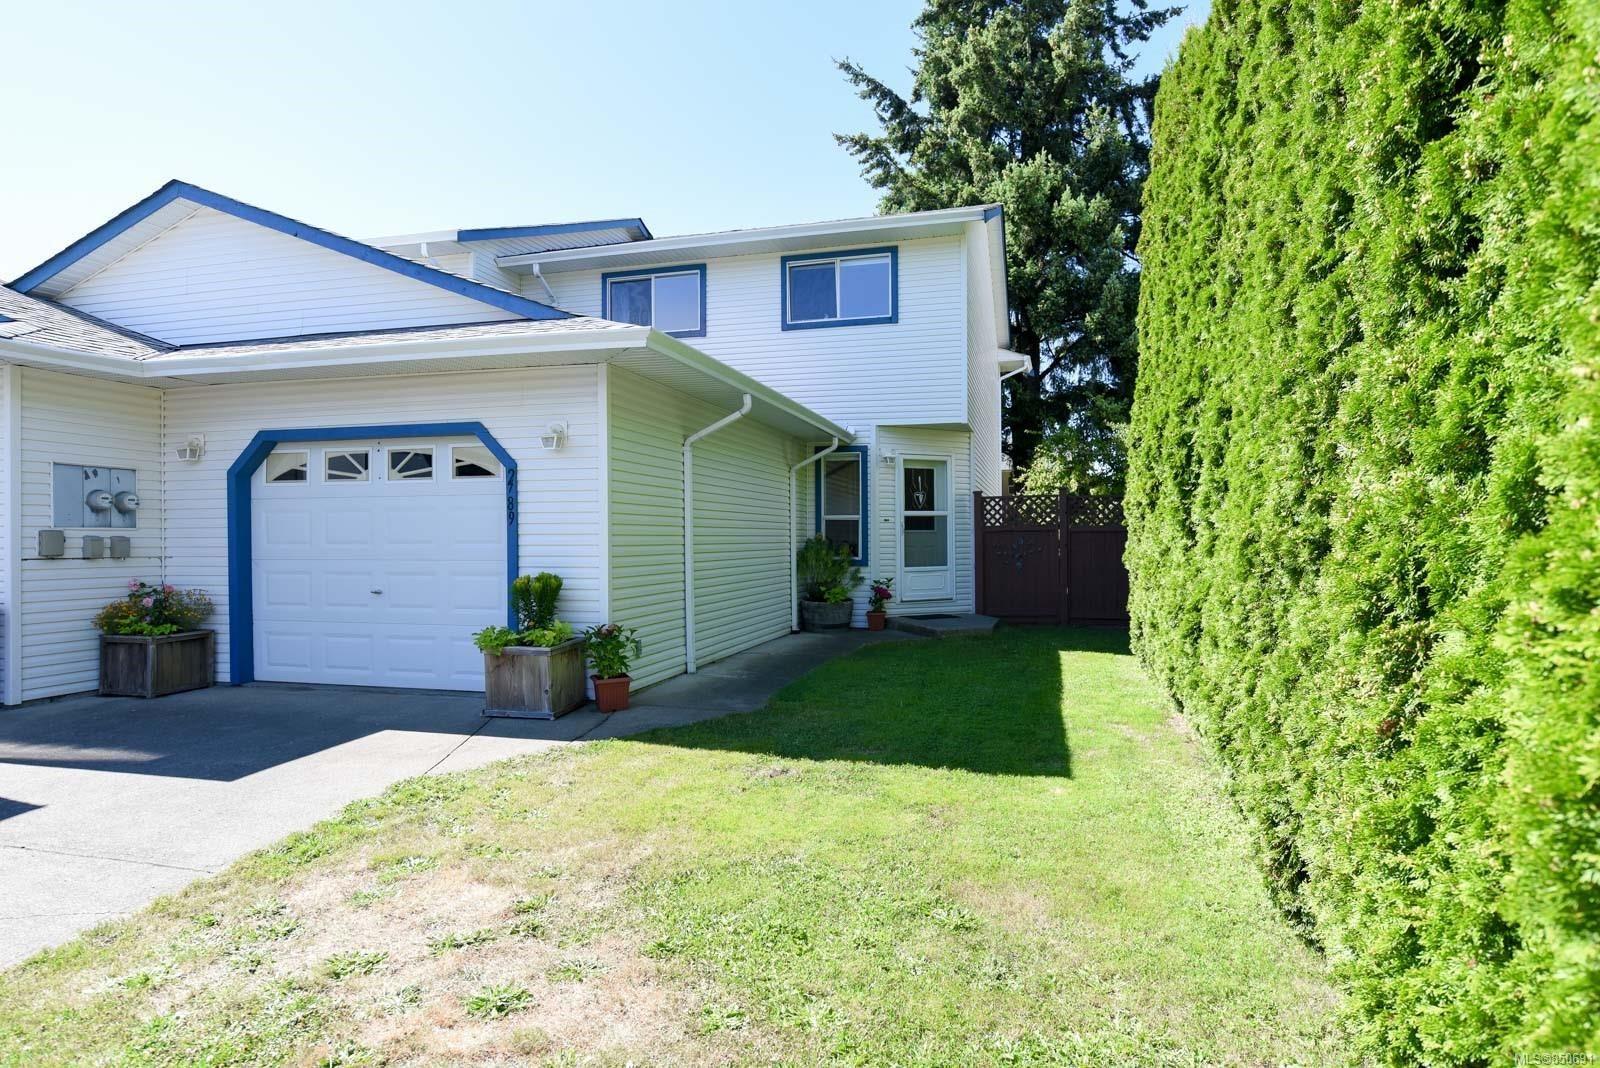 Main Photo: B 2789 Myra Pl in : CV Courtenay East Half Duplex for sale (Comox Valley)  : MLS®# 850691